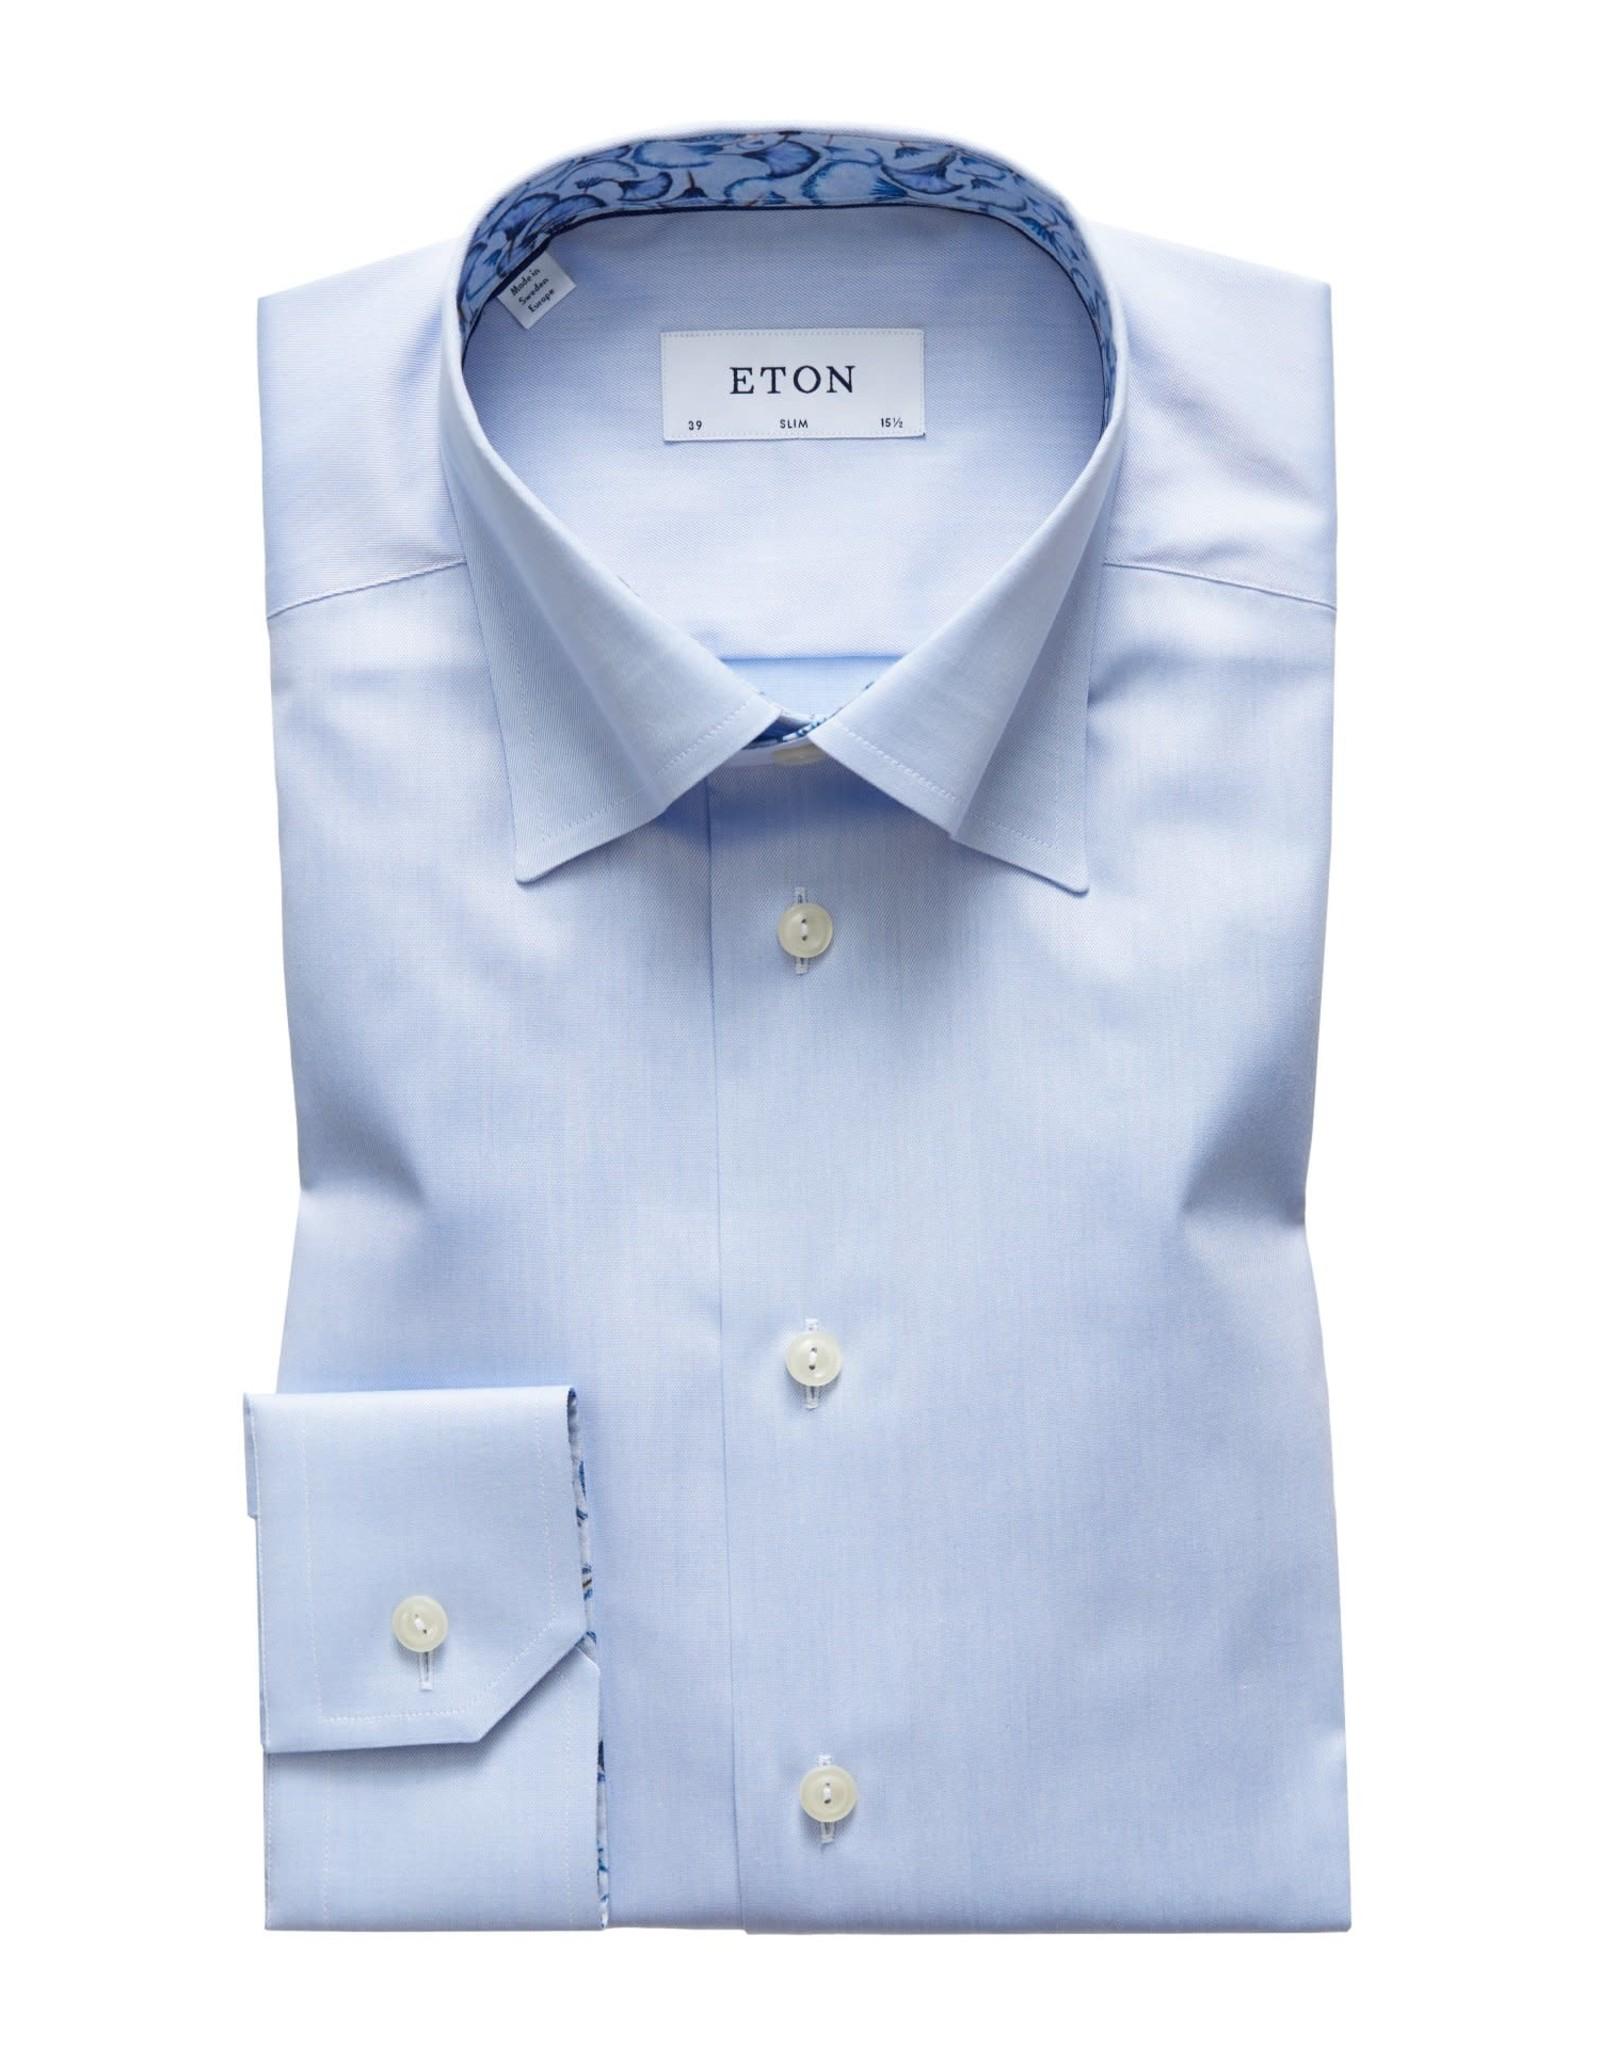 Eton Eton hemd contemporary blauw contrast 58